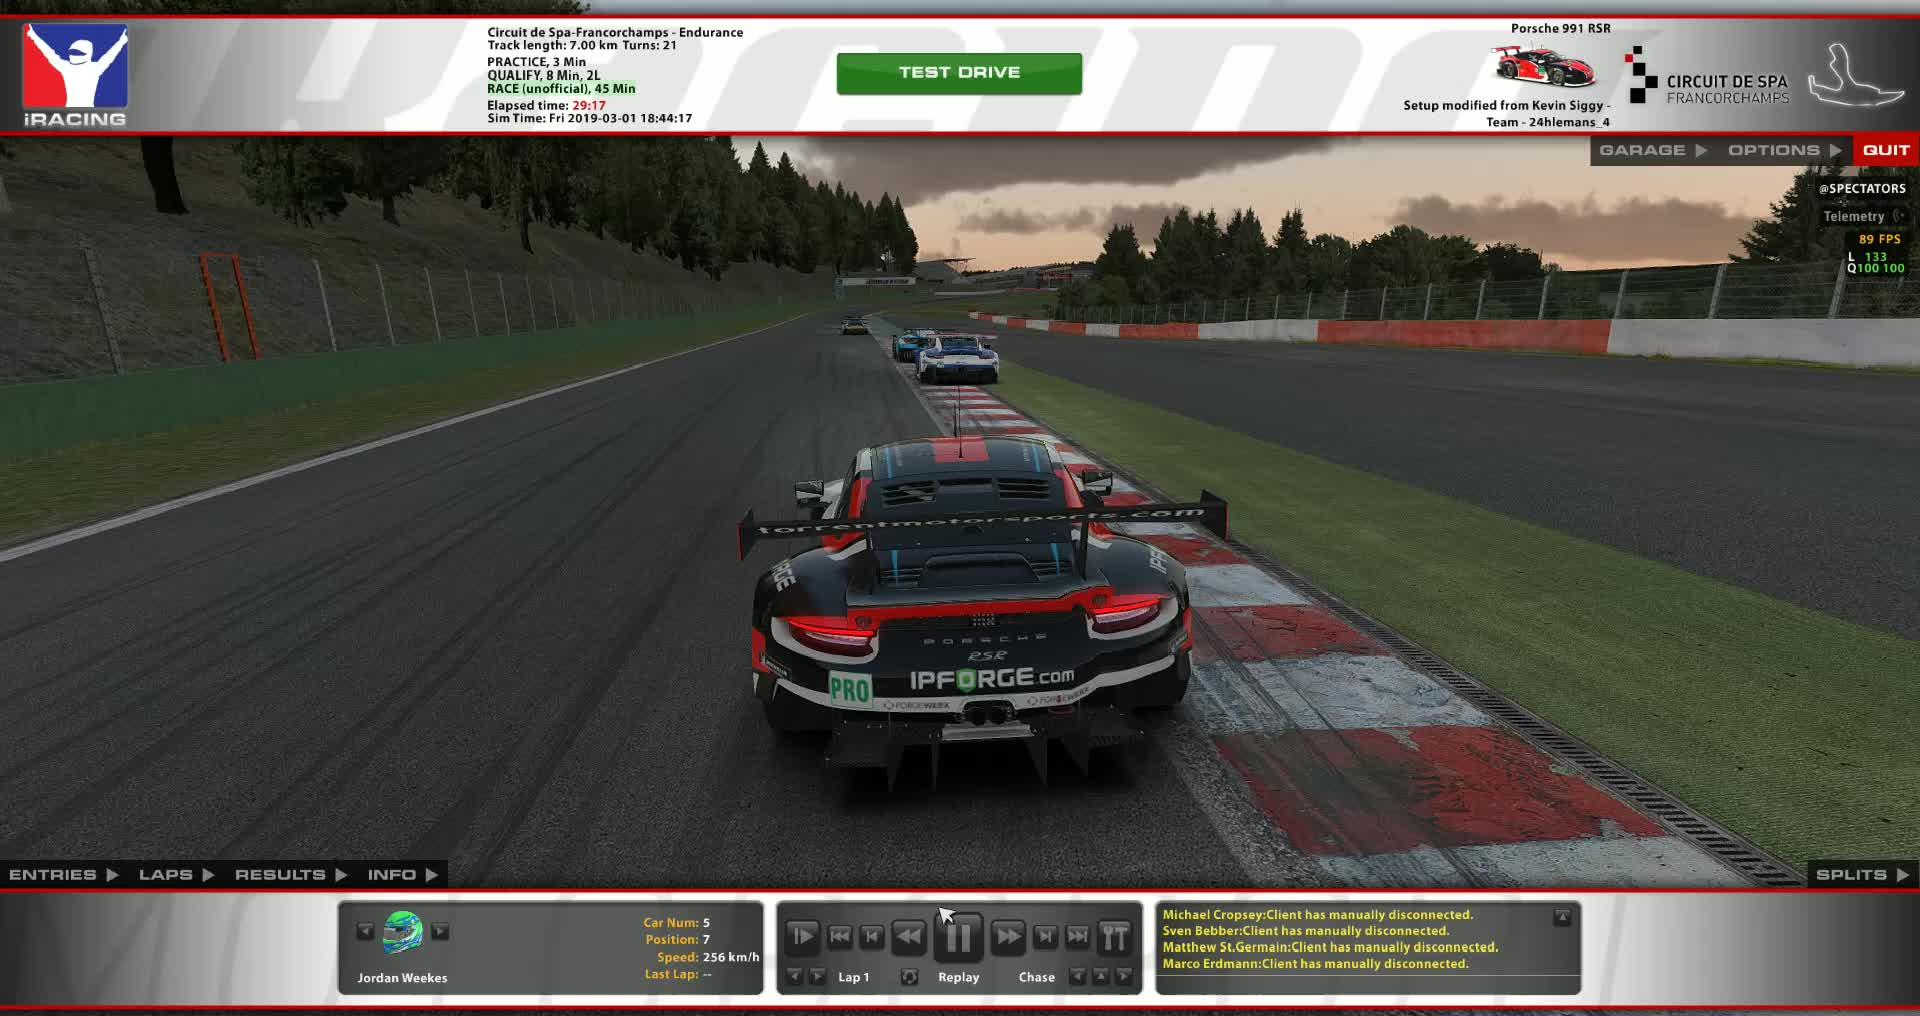 I Racing Motorsport Simulator 2019 02 24 21 26 17 12